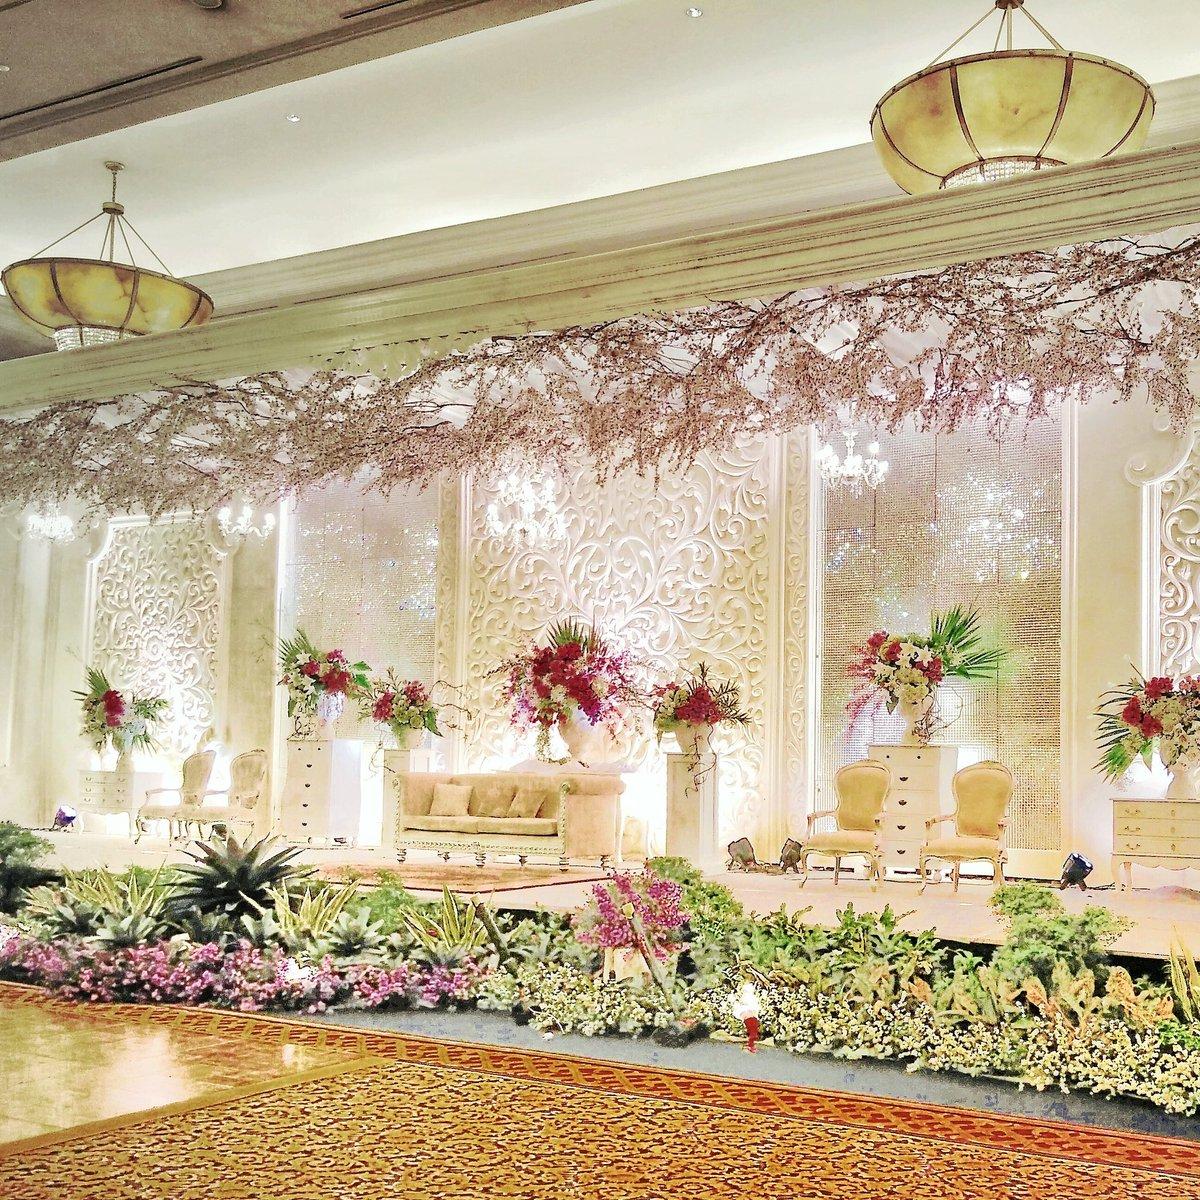 Tiara dekorasi abadi tiaradekorasi twitter pelaminan wedding decoration weddingdecoration dekorasi pernikahan dekorasipernikahan bridemaidspicitter1vdnt24mpu junglespirit Choice Image